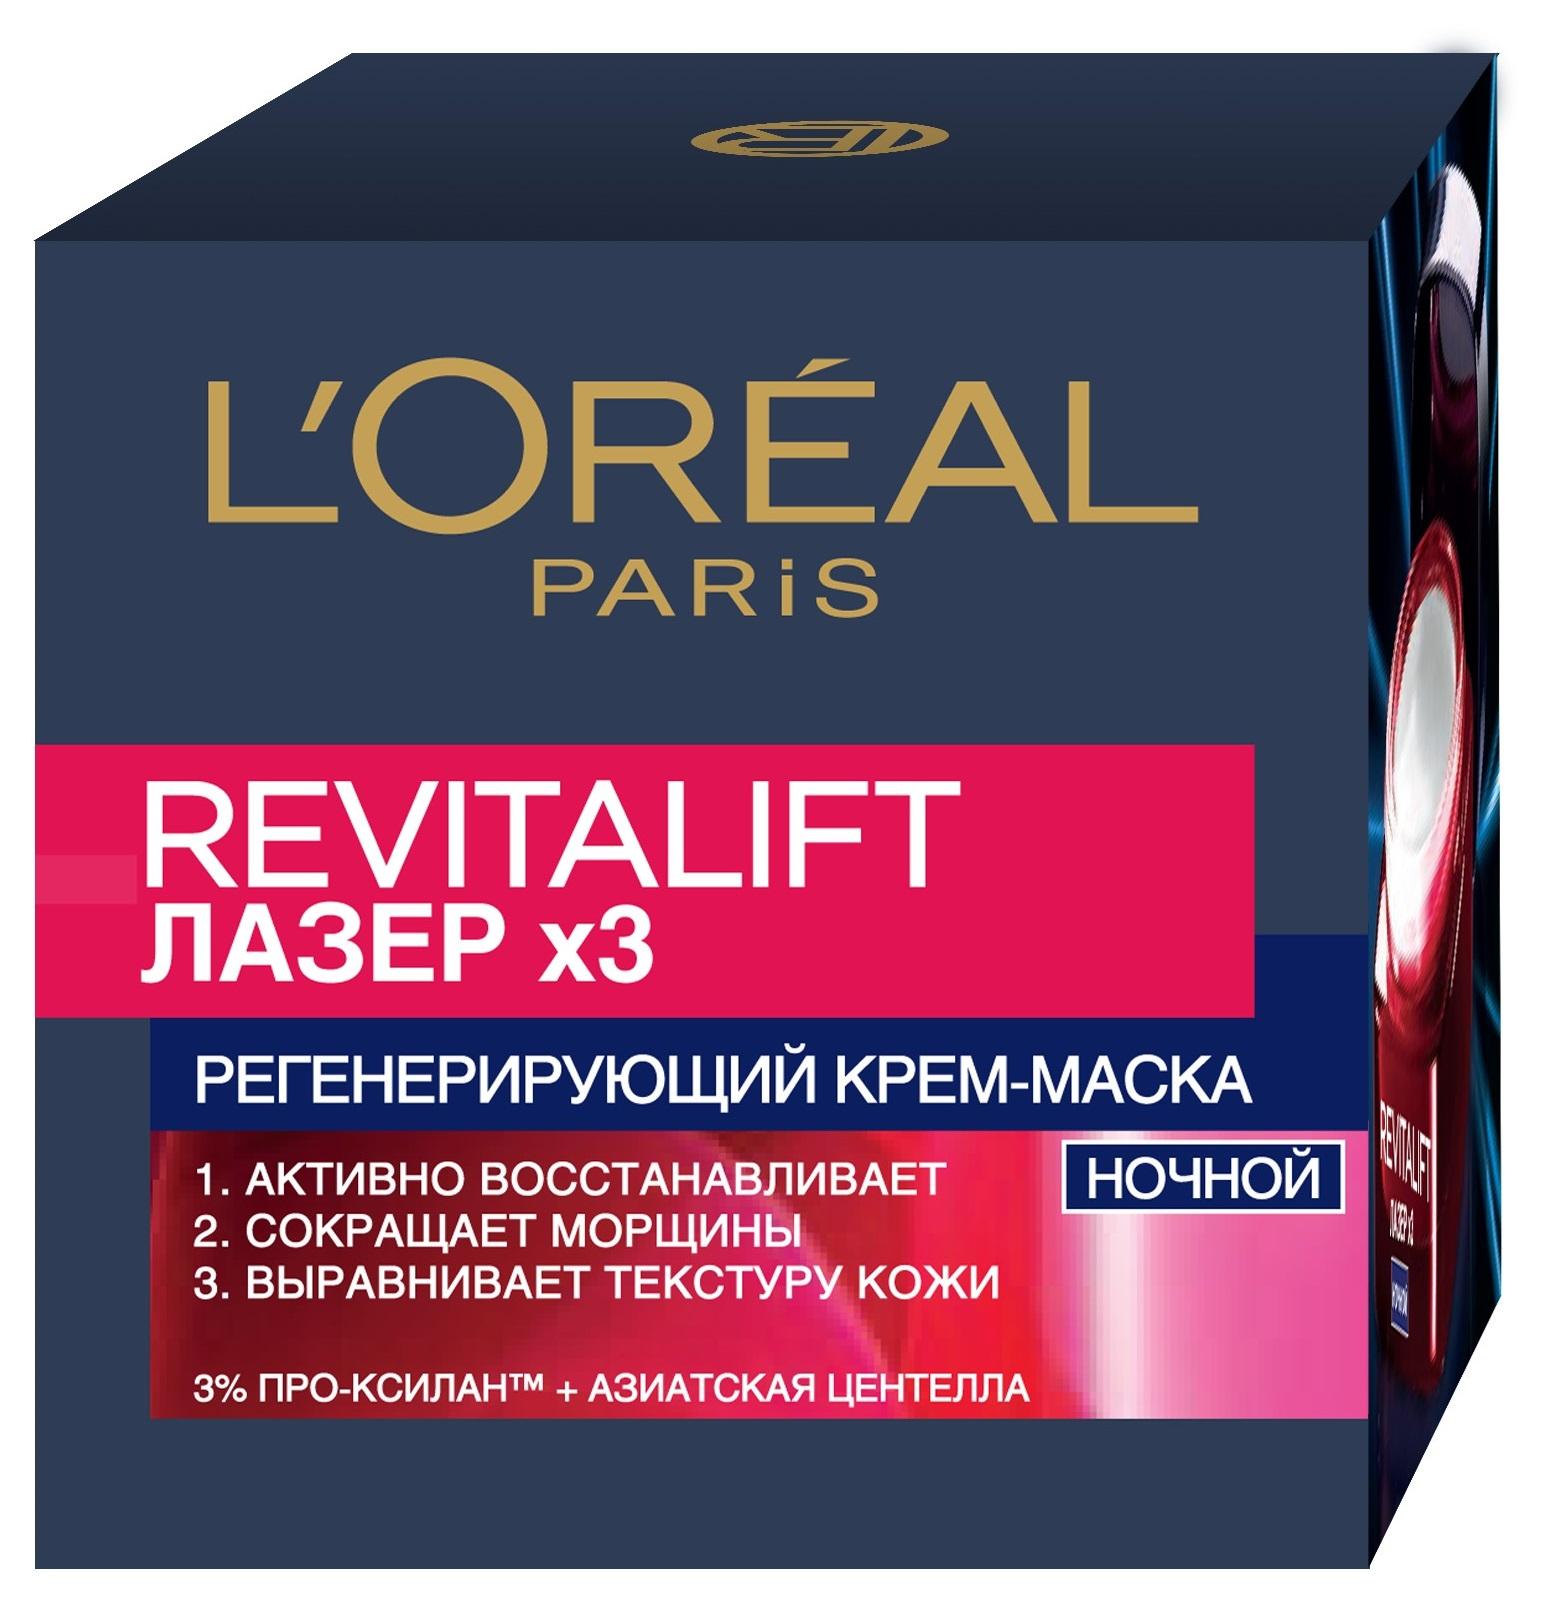 Крем для лица L\'Oreal Paris Revitalift Лазер Х3 Регенерирующий глубокий уход, ночной 50 мл